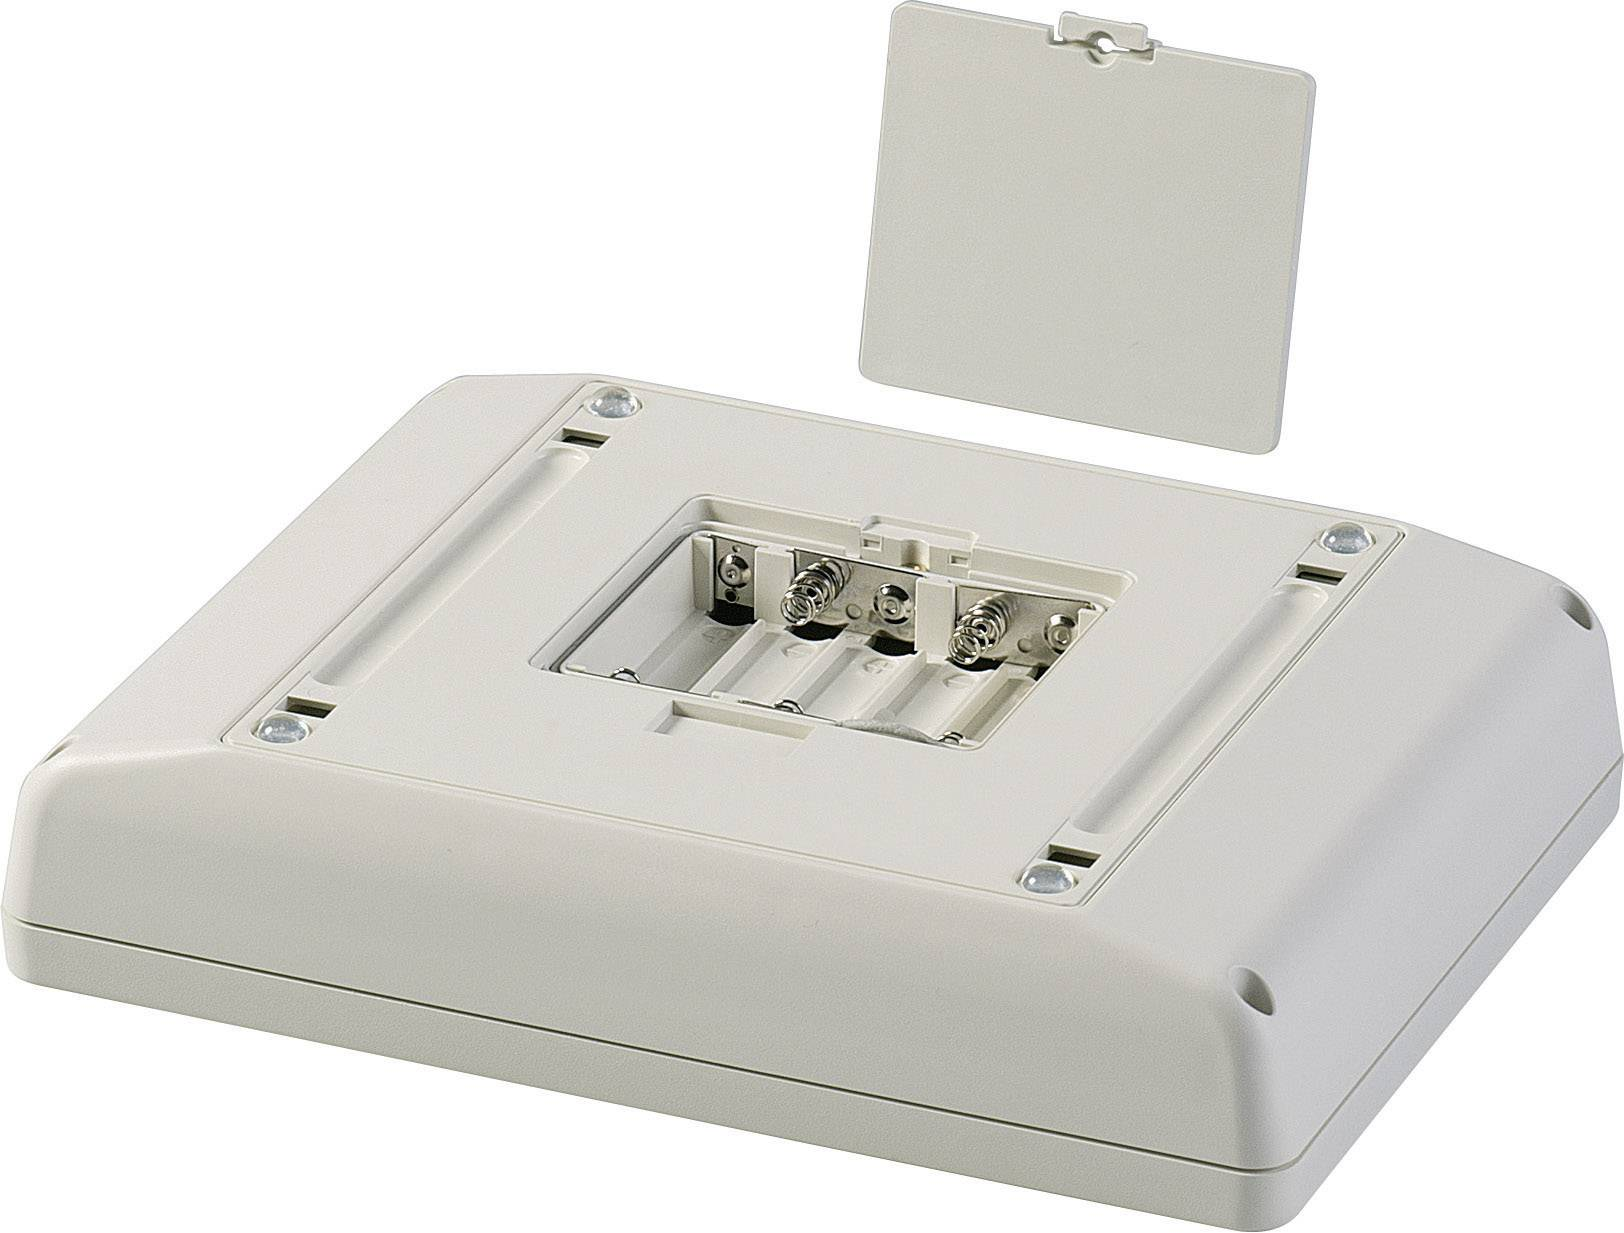 Pultové pouzdro plastové OKW D4044137, (d x š x v) 166 x 225 x 48 mm, šedá